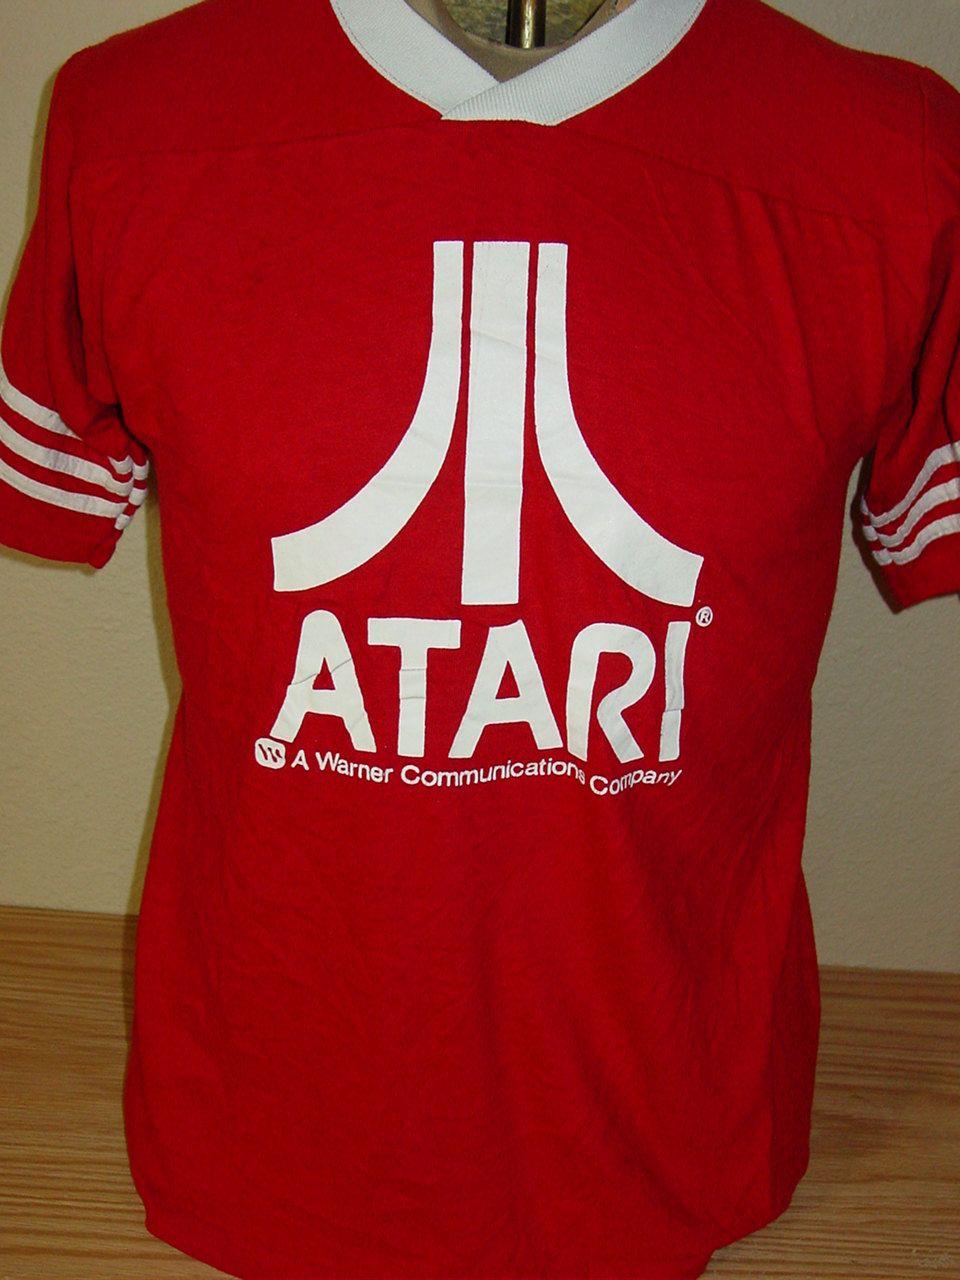 Vintage 1980s Atari jersey t shirt Medium by